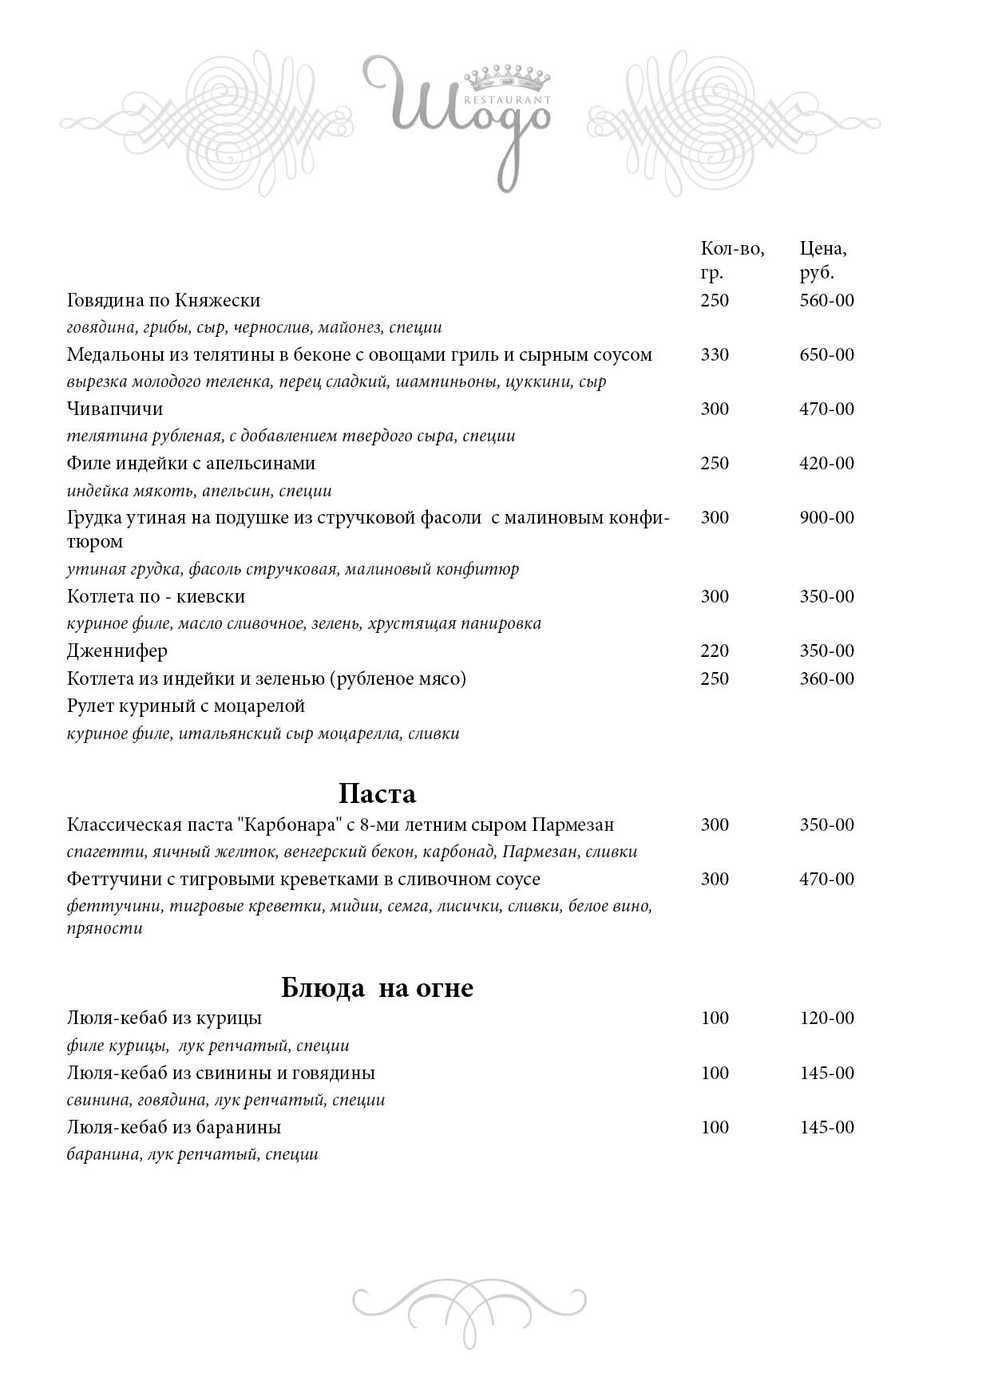 Меню ресторана Шодо на Левобережной улице фото 1